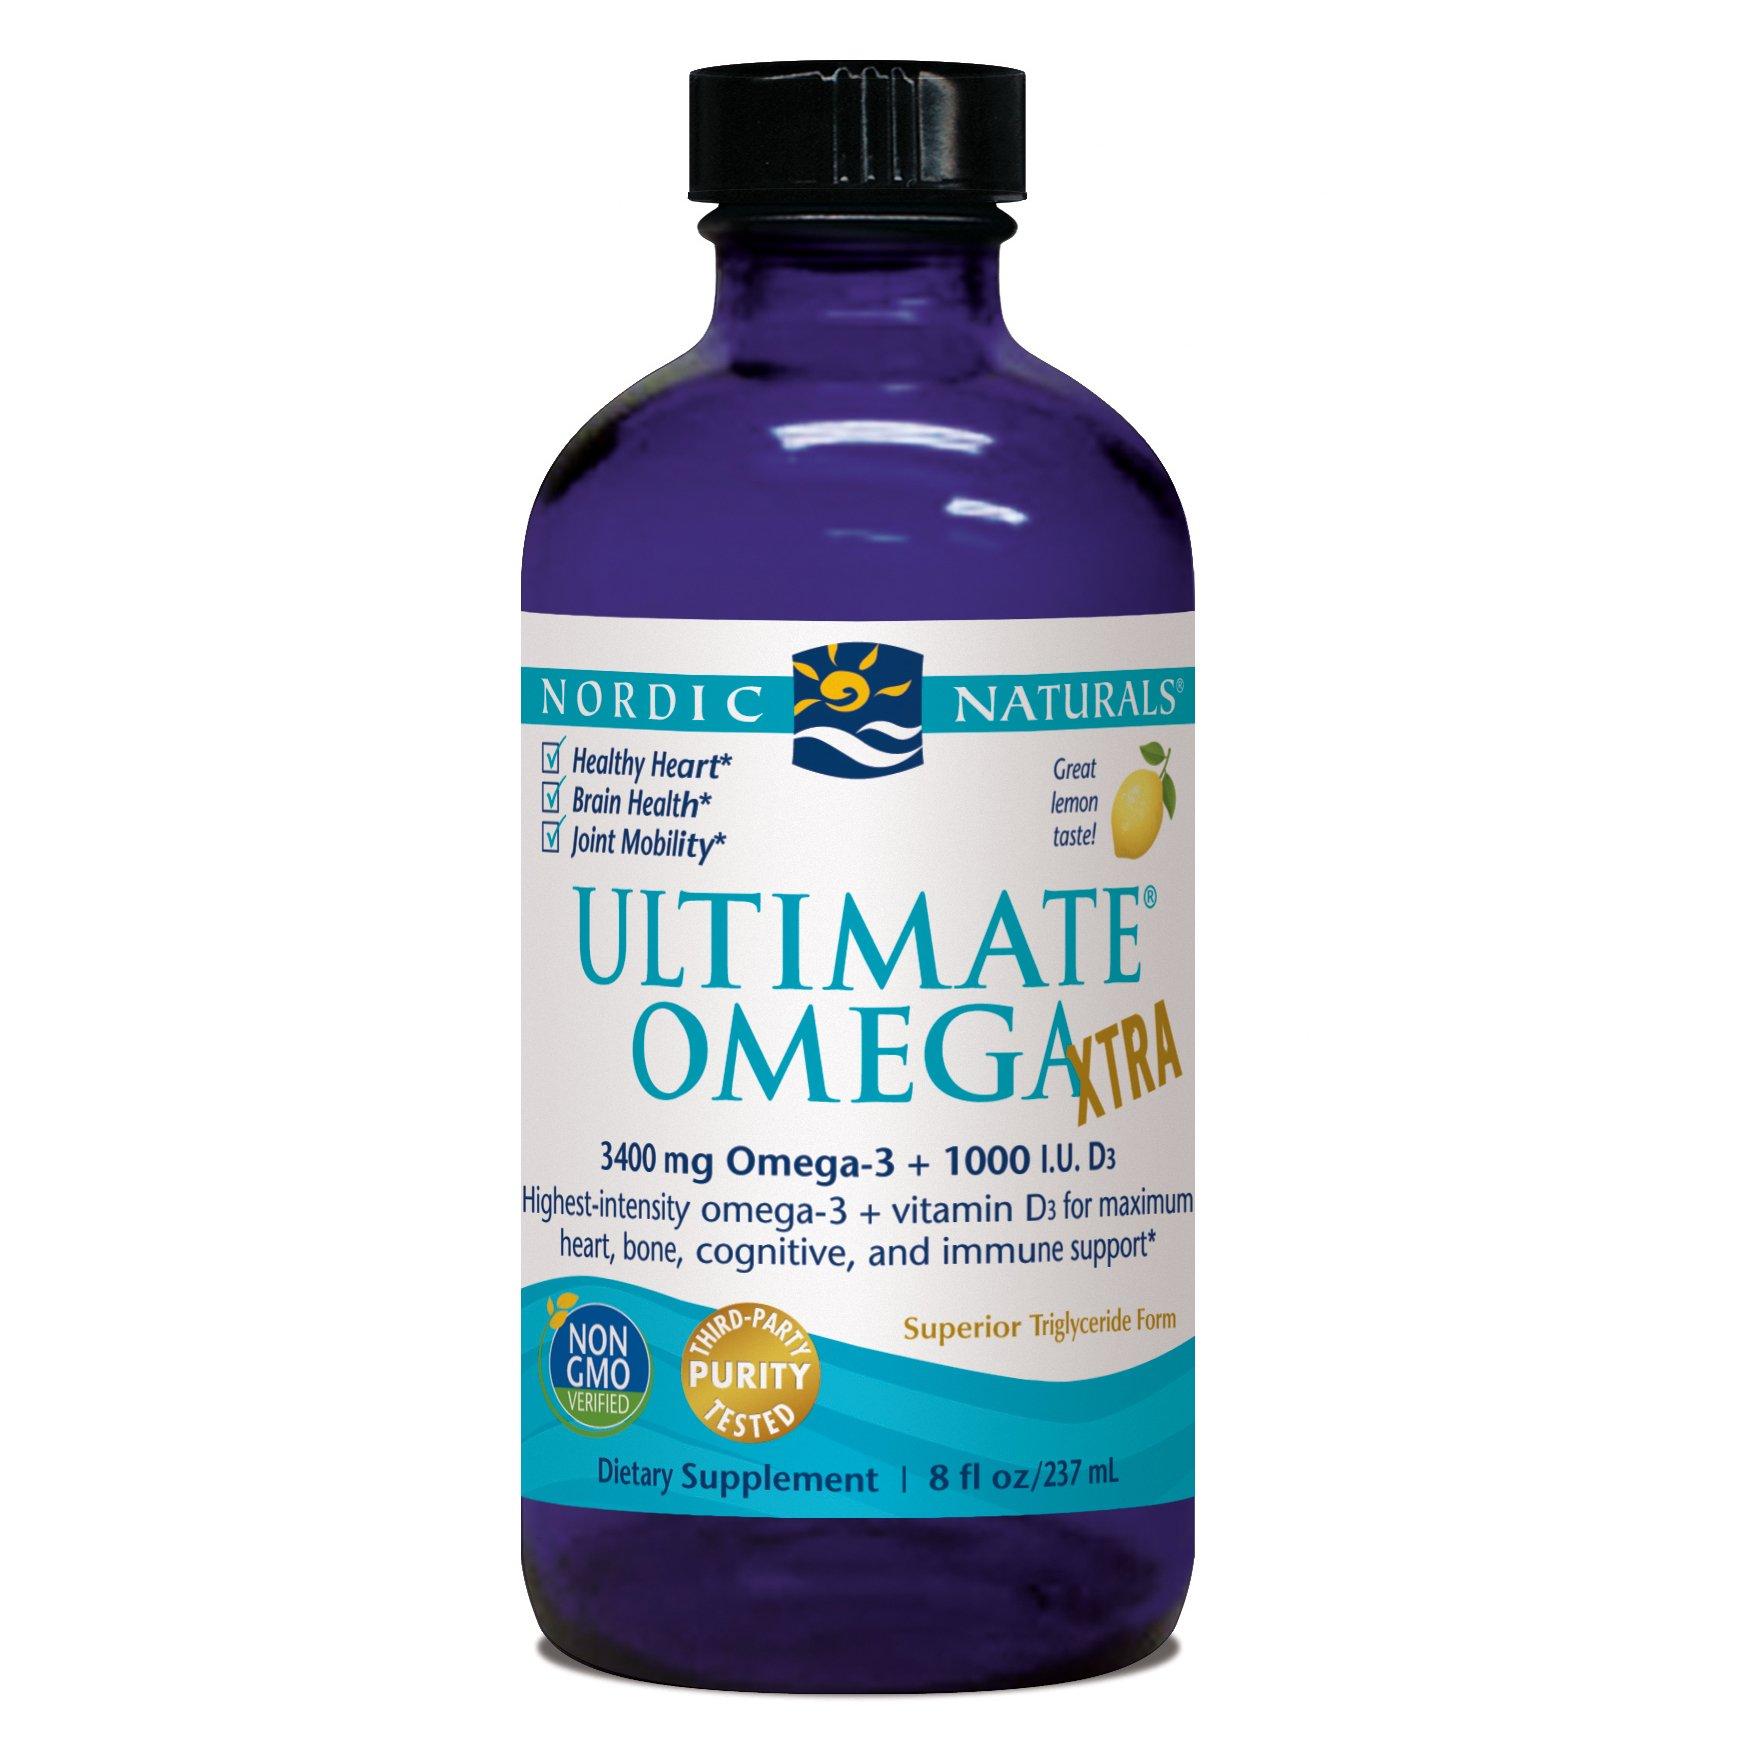 Nordic Naturals Ultimate Omega Xtra